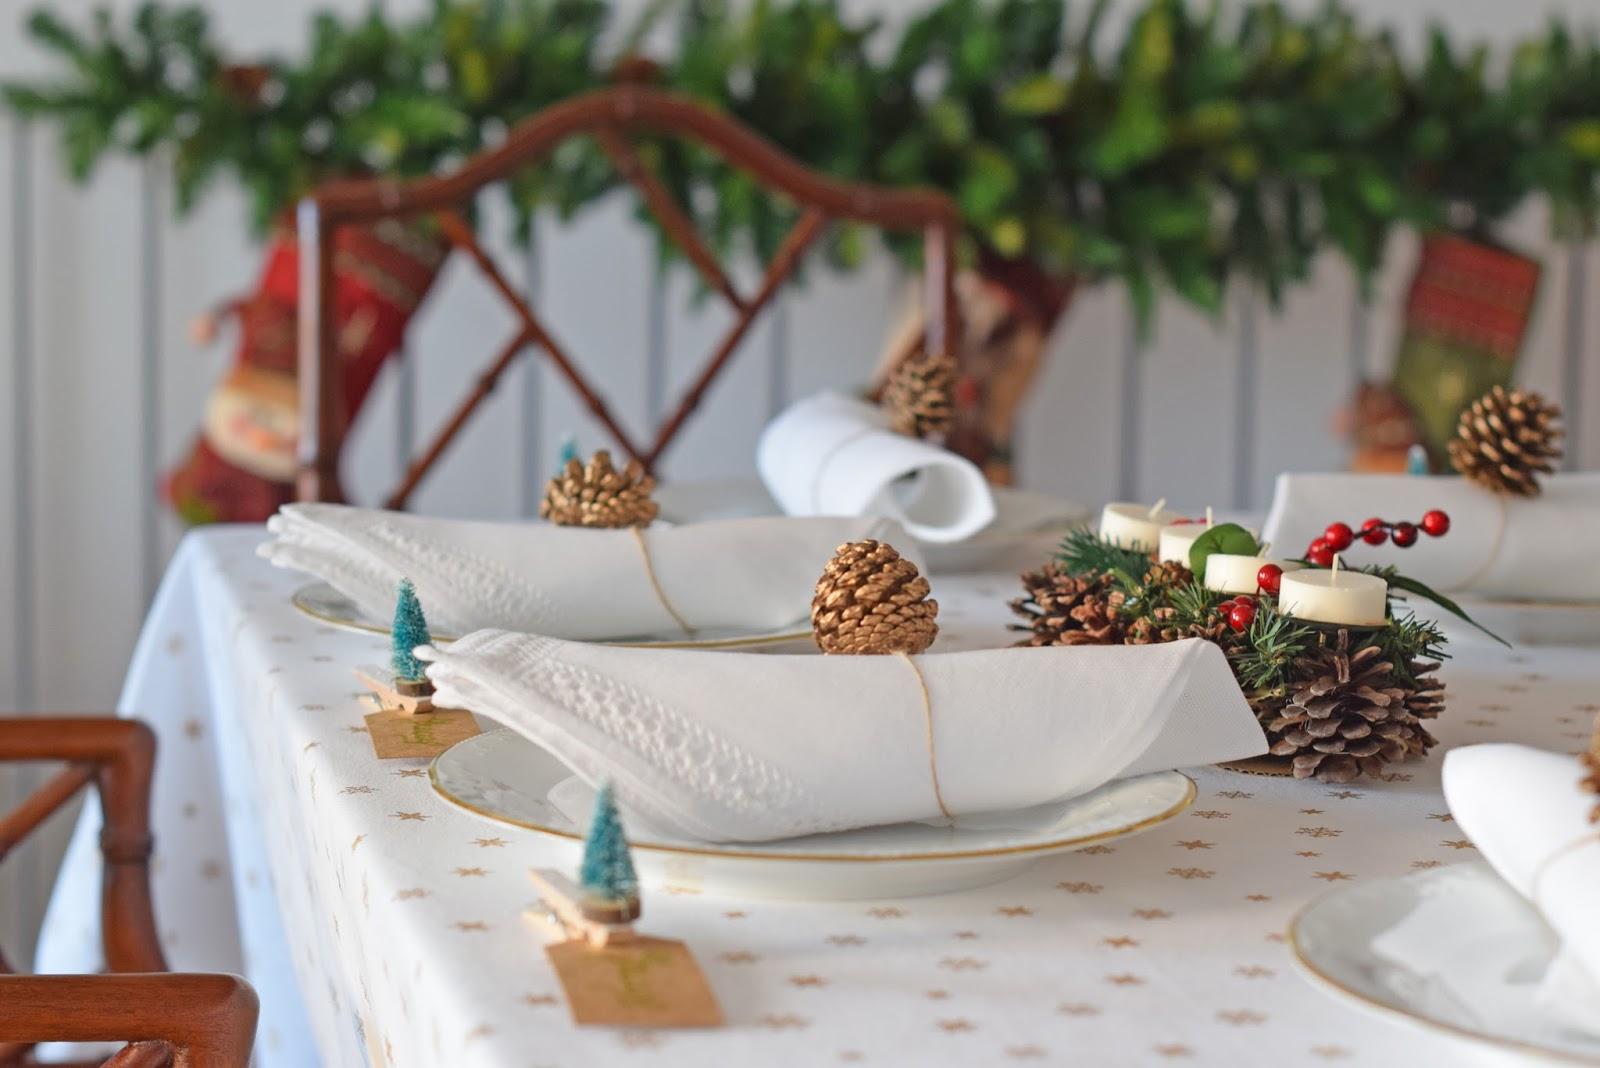 Ale samaniego thanksgiving 2017 ideas para decorar una mesa de navidad - Decorar una mesa de navidad ...